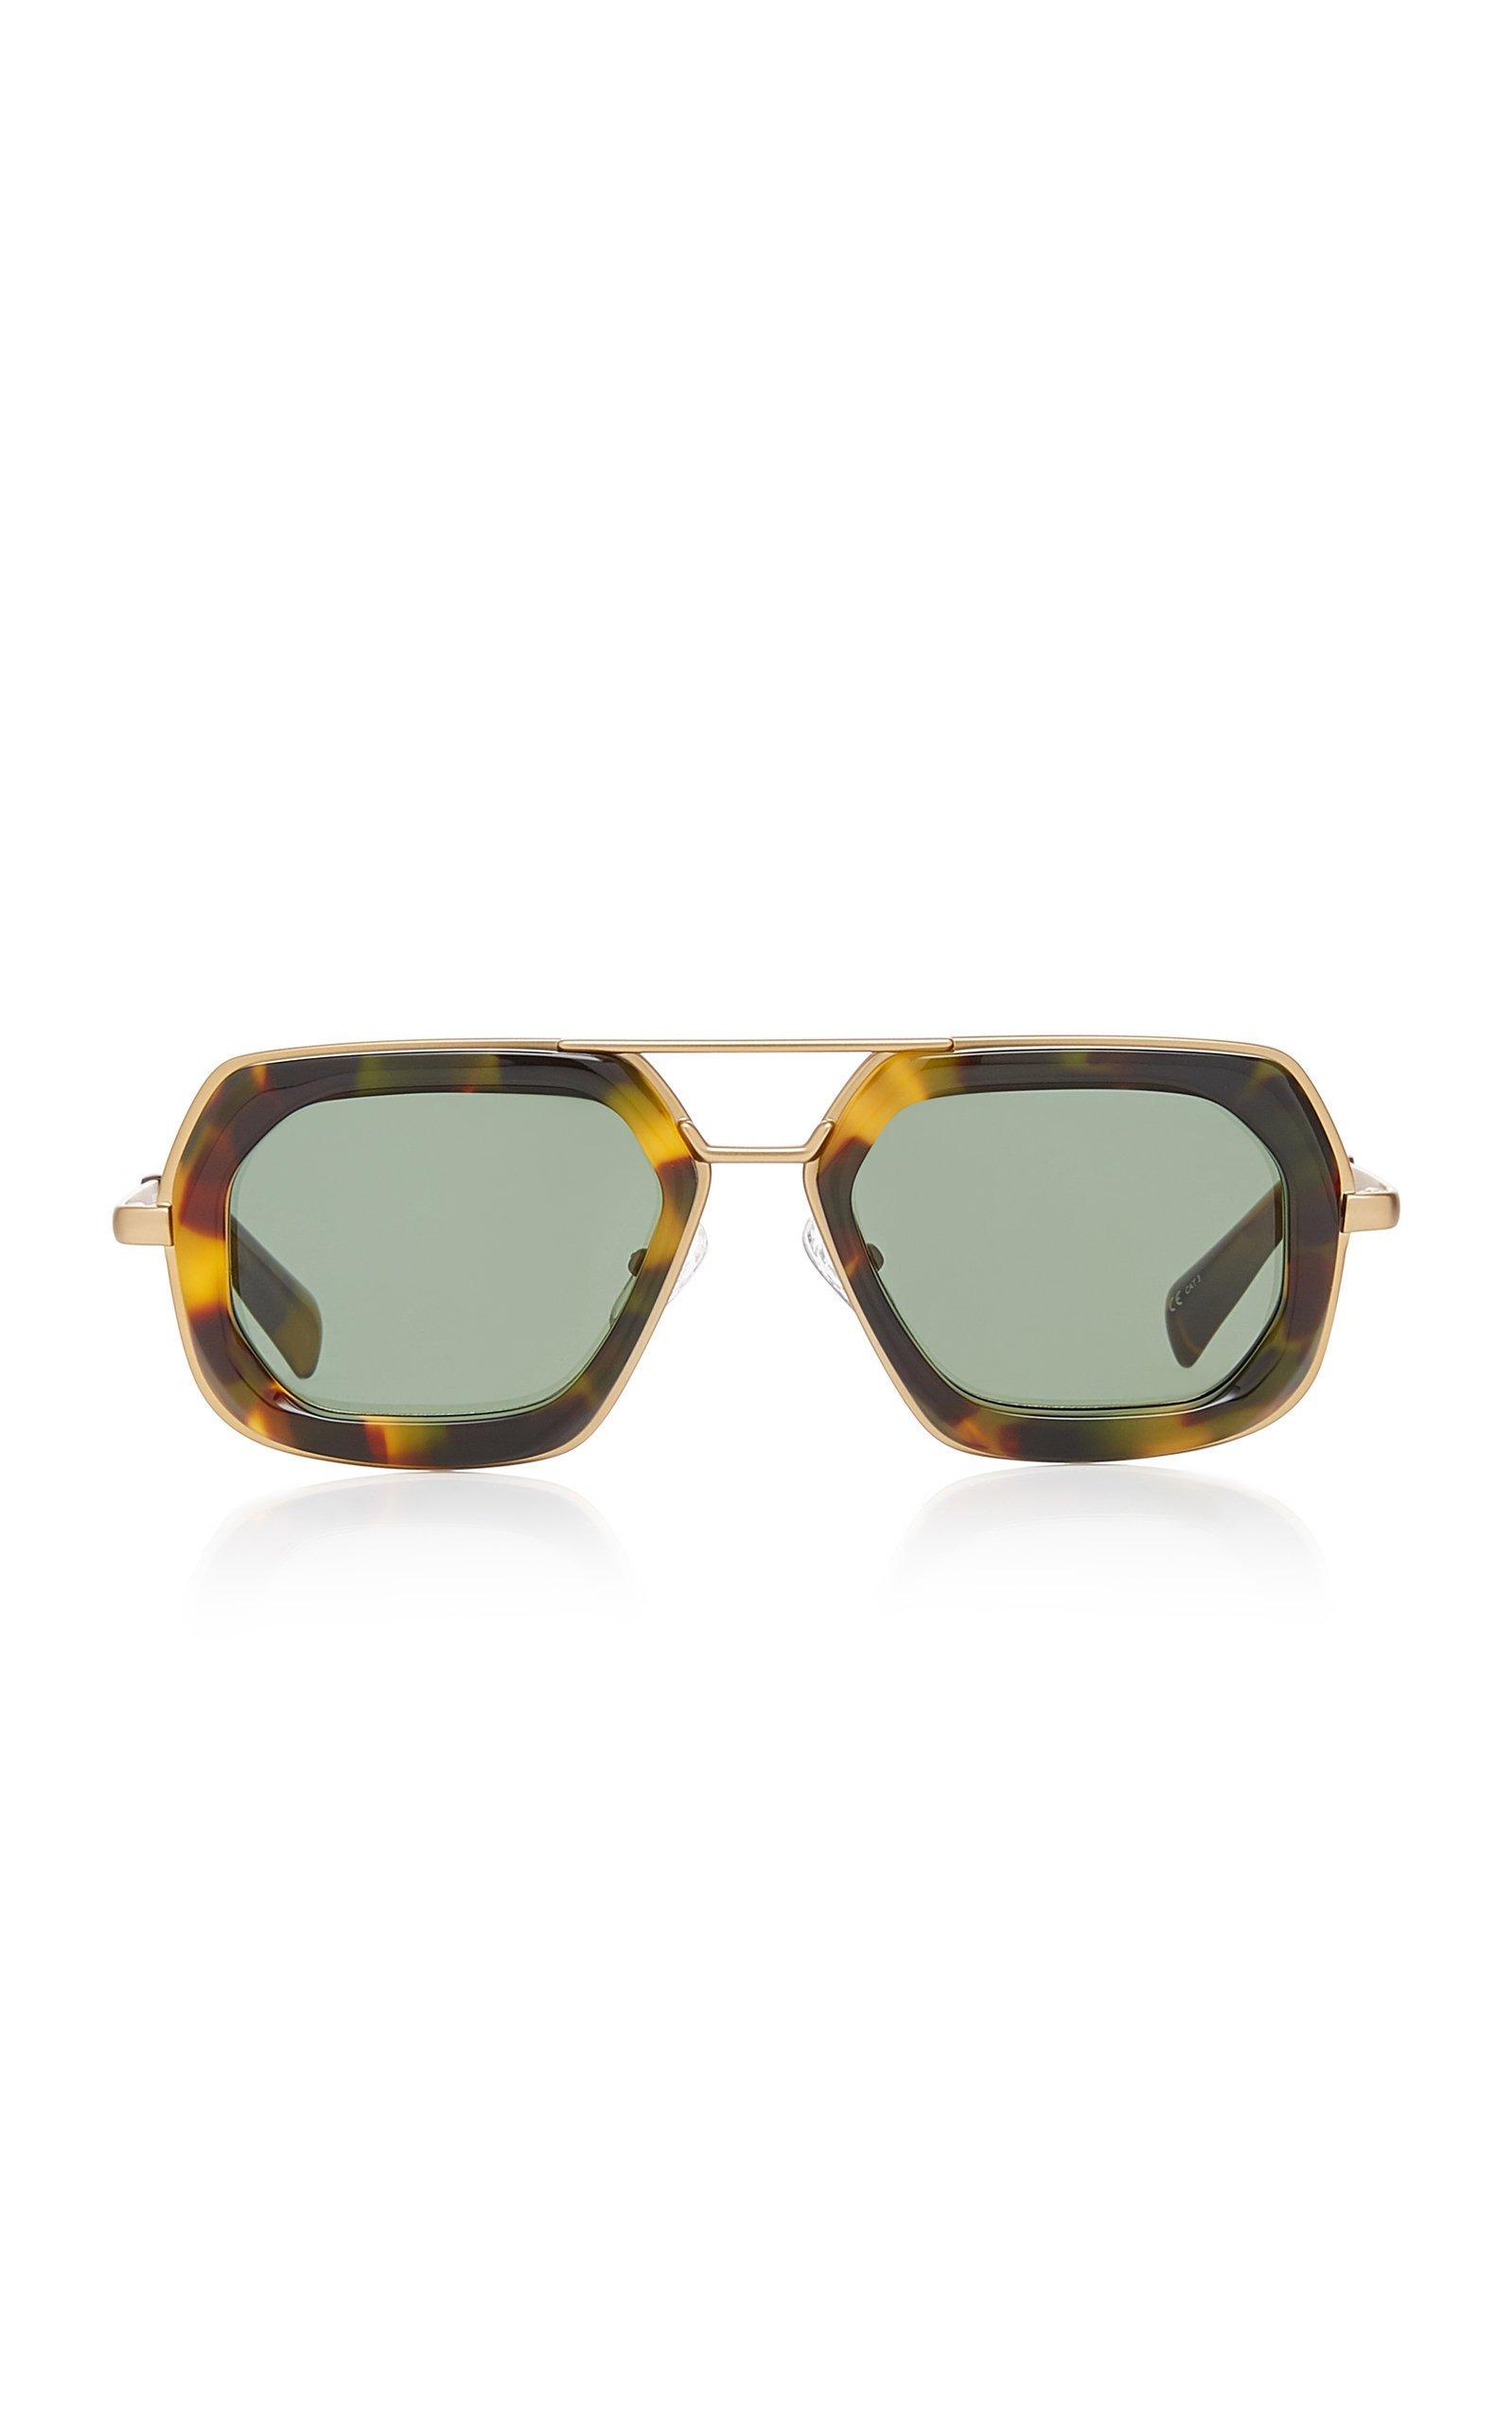 Dries Van Noten Oversized Acetate Aviator-Style Sunglasses